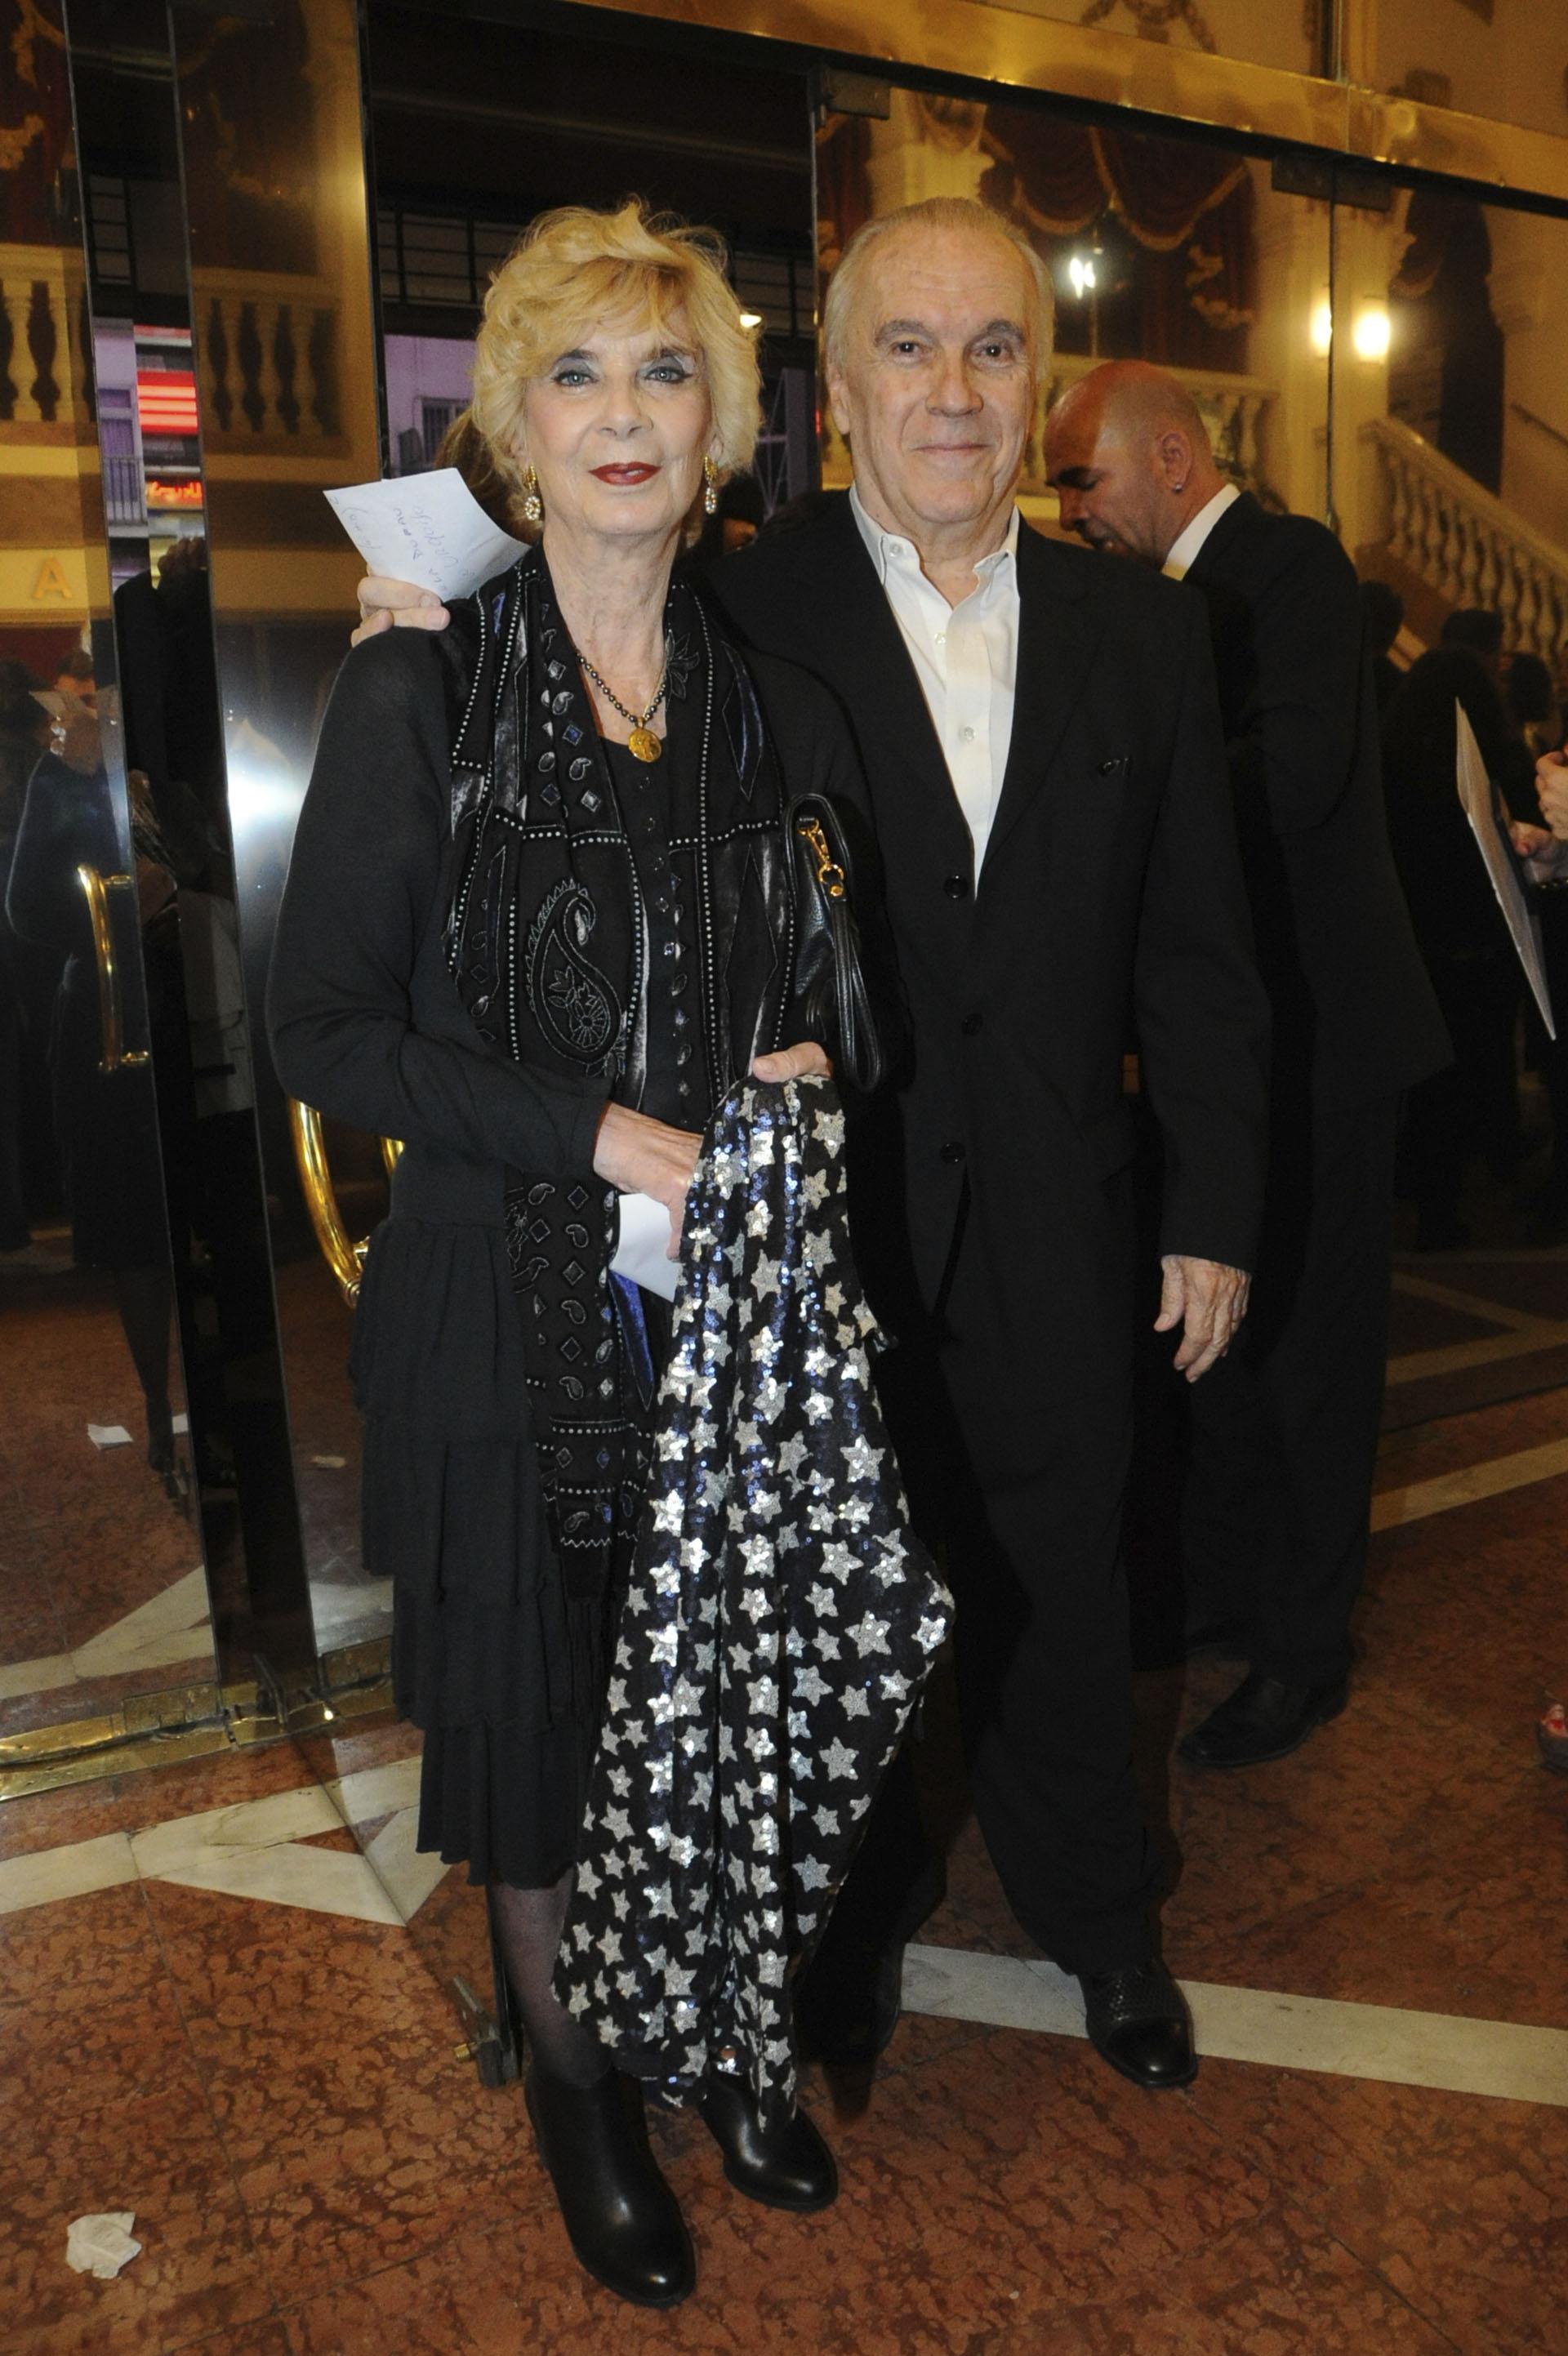 Graciela Dufau y Hugo Urquijo